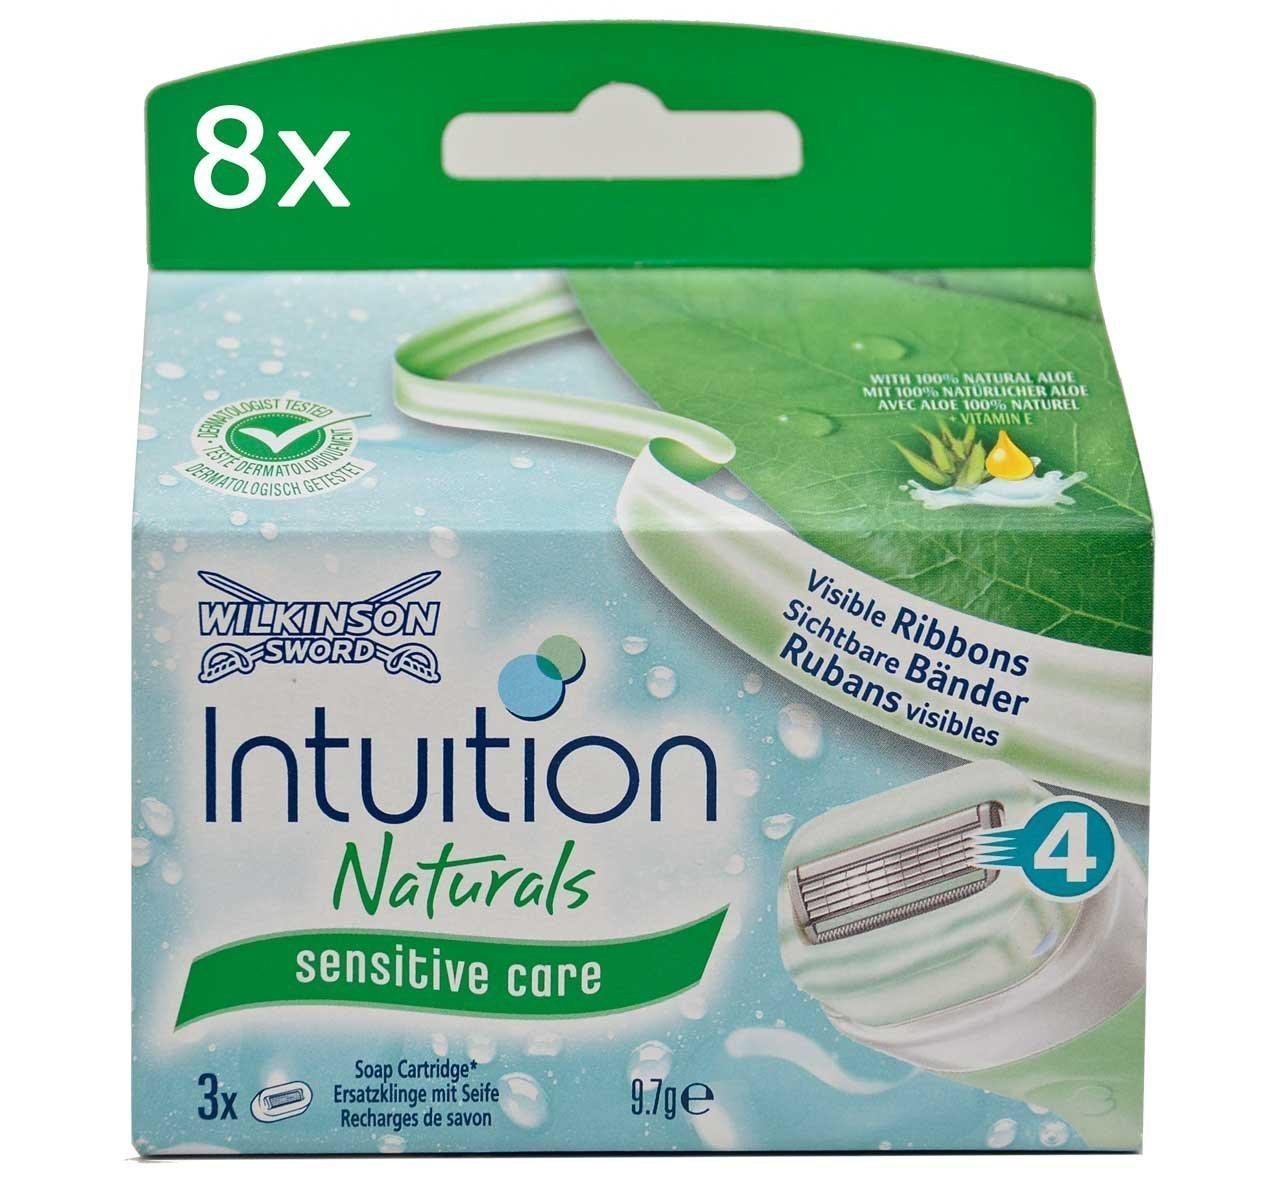 8x Wilkinson Intuition Naturals Sensitive Care 3Razor Blades with Soap and Aloe Wilkinson Sword